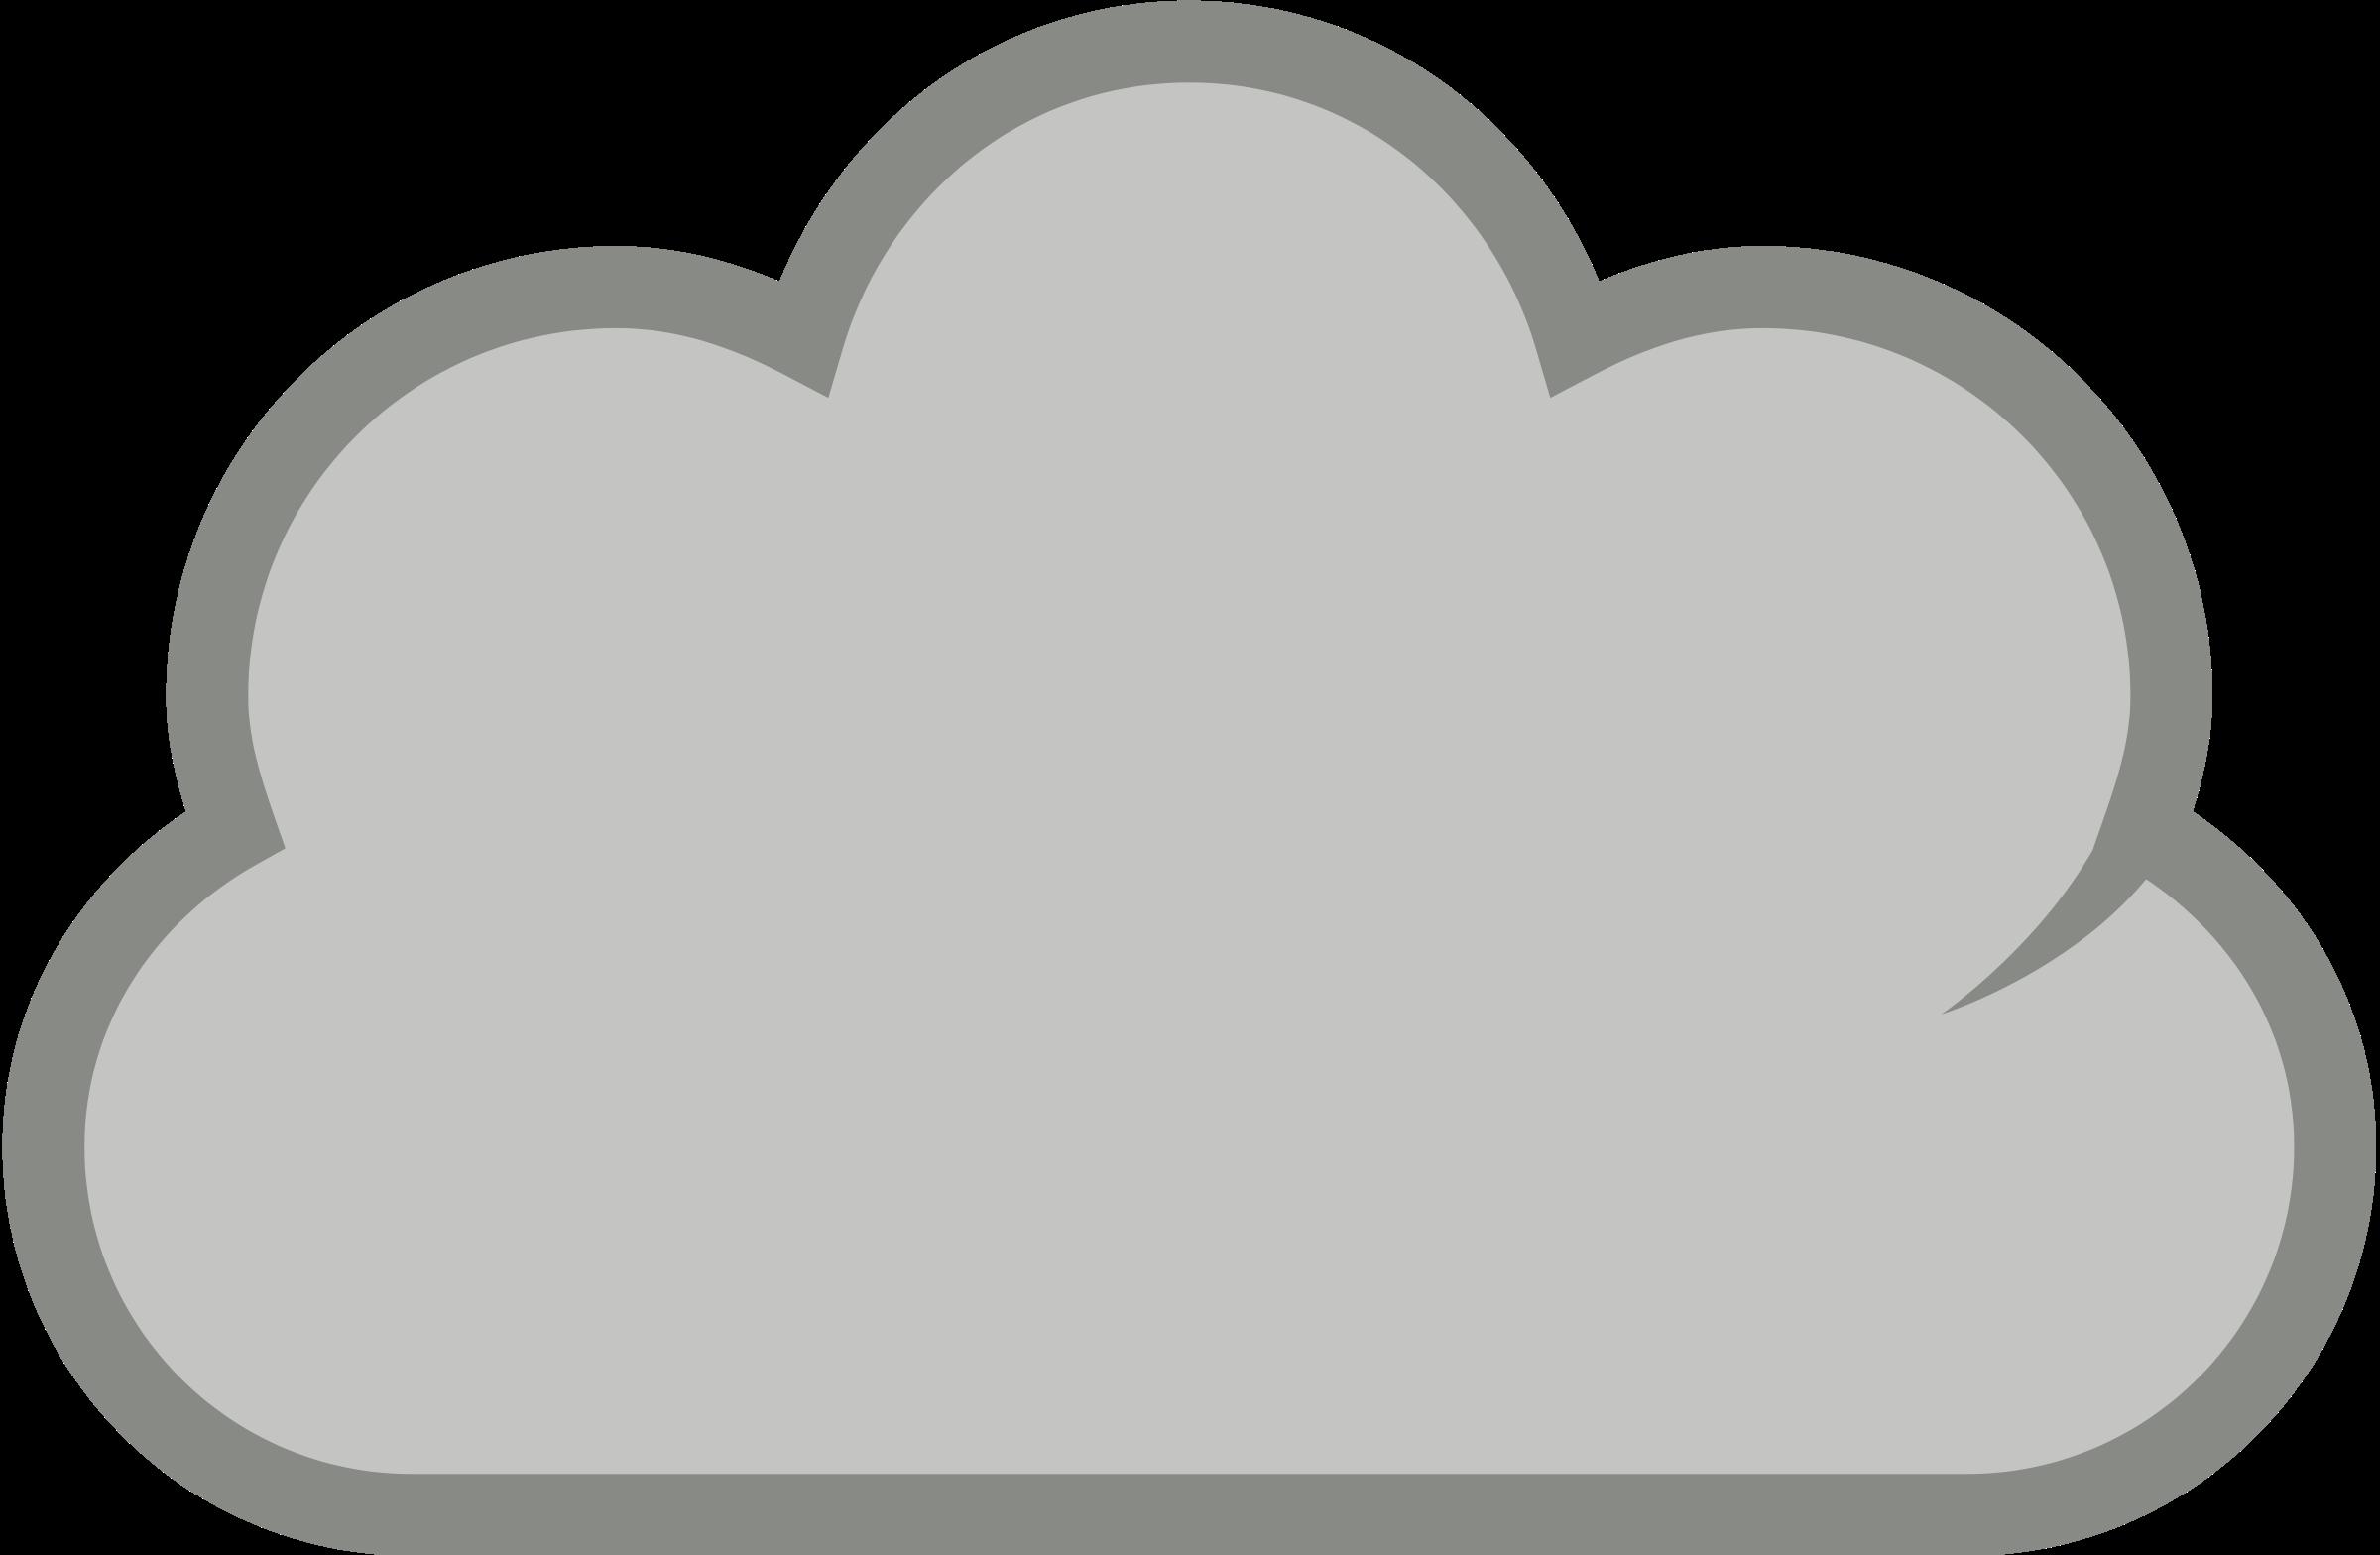 Cloud Cliparts Clipart Panda Free Clipar-Cloud Cliparts Clipart Panda Free Clipart Images-9